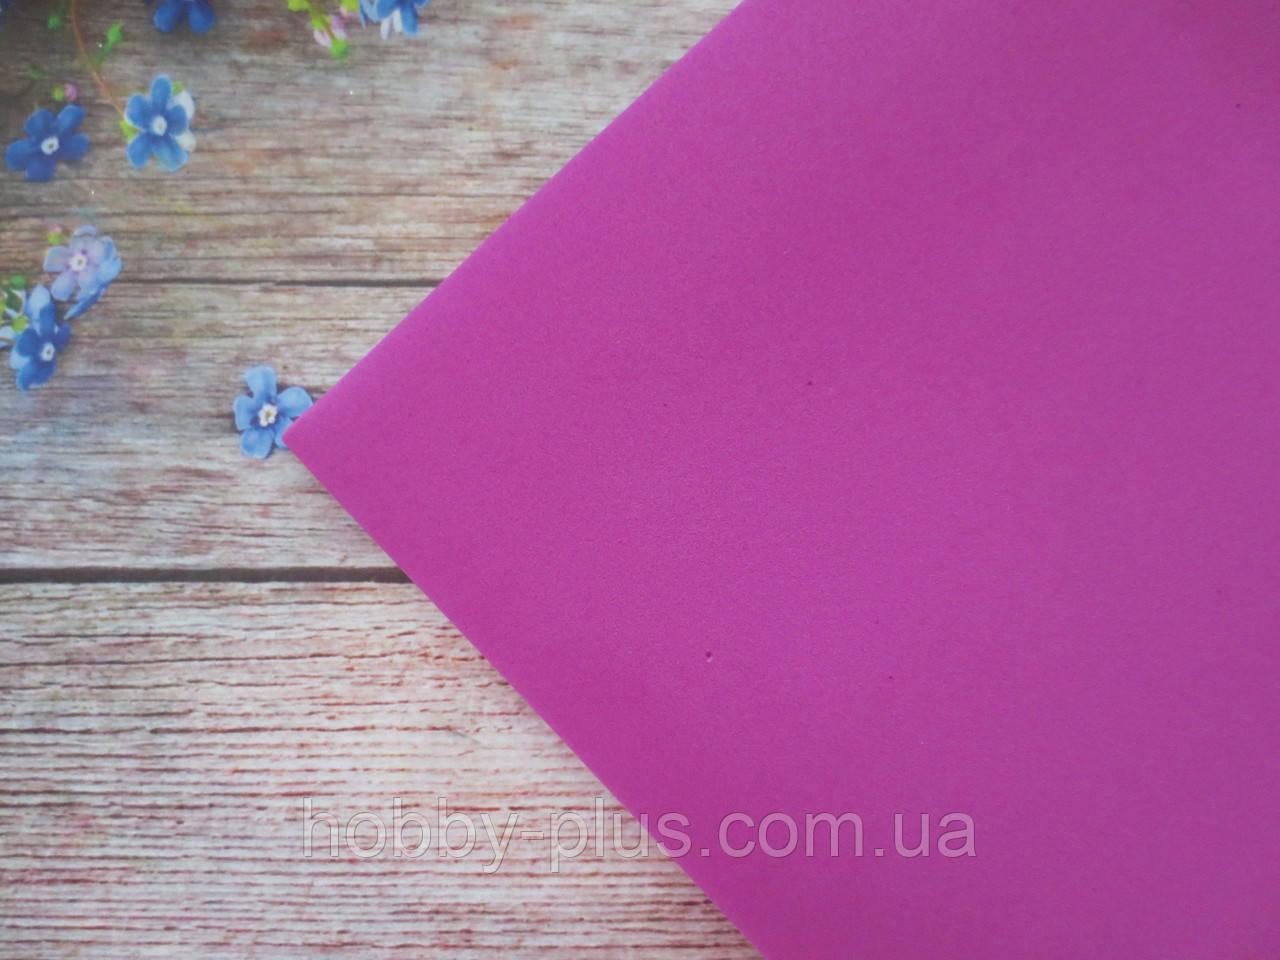 Фоамиран 1 мм, 50х50 см, цвет ФУКСИЯ